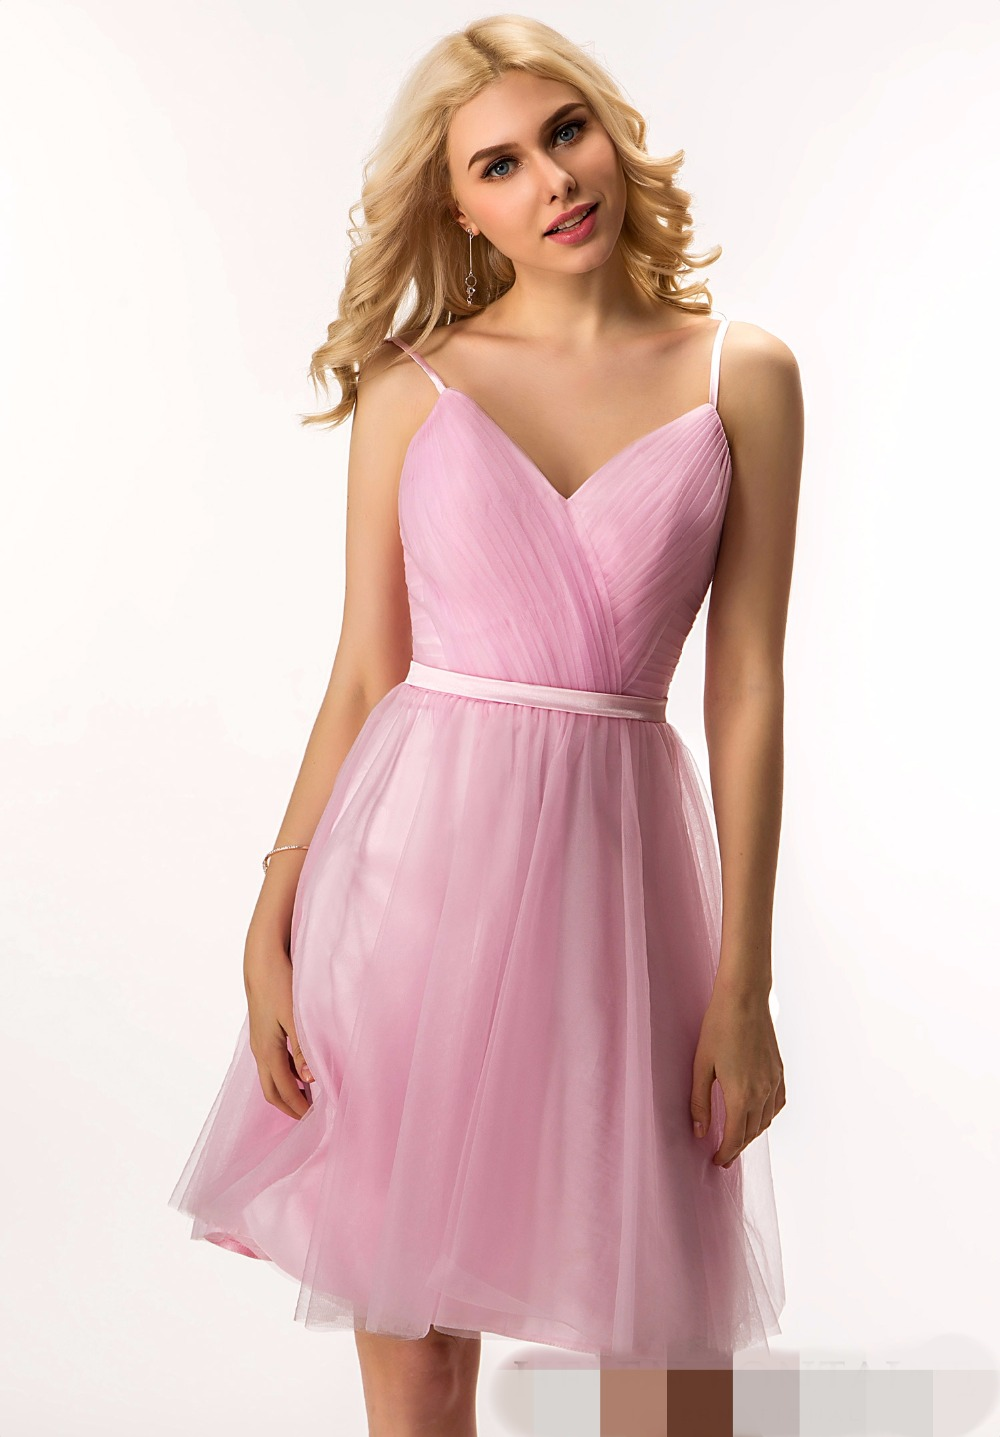 Asombroso Caer Vestido De Dama Elaboración - Colección de Vestidos ...